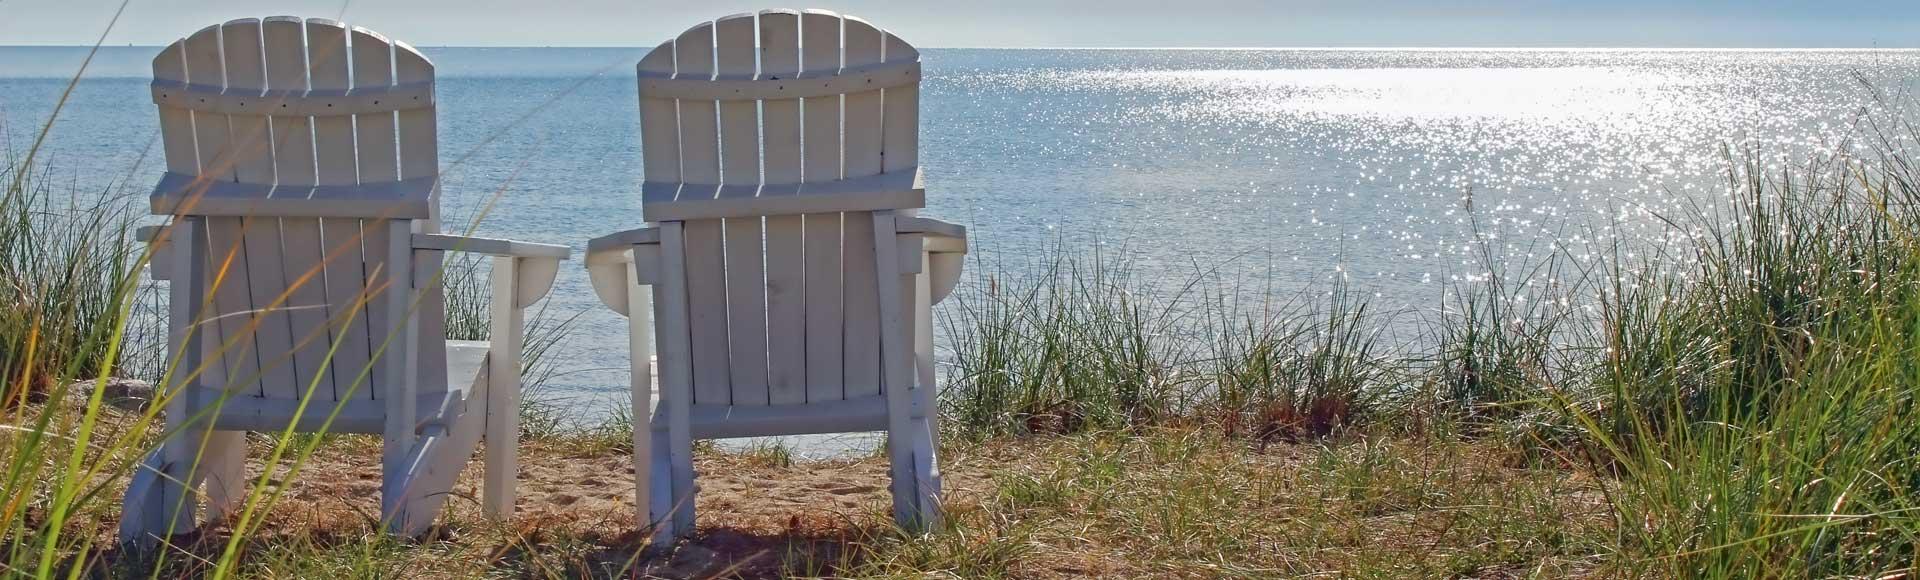 CYCT-LakeMichigan-2-Chairs-Overlook_1920x580